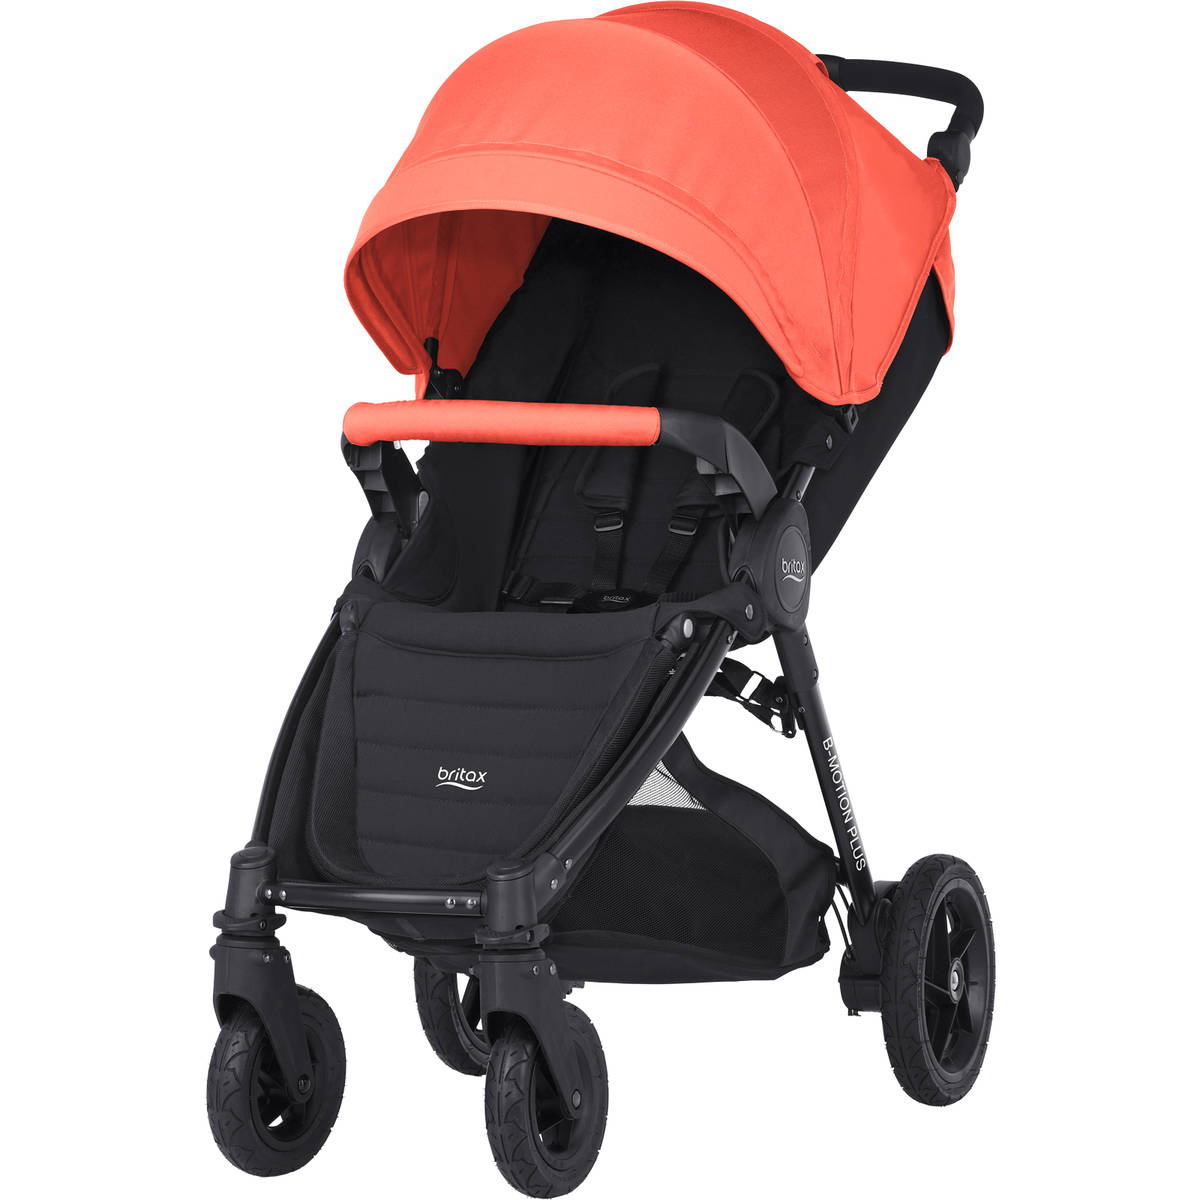 Coral Peach - Matkarattaat - 3633320012 - 10